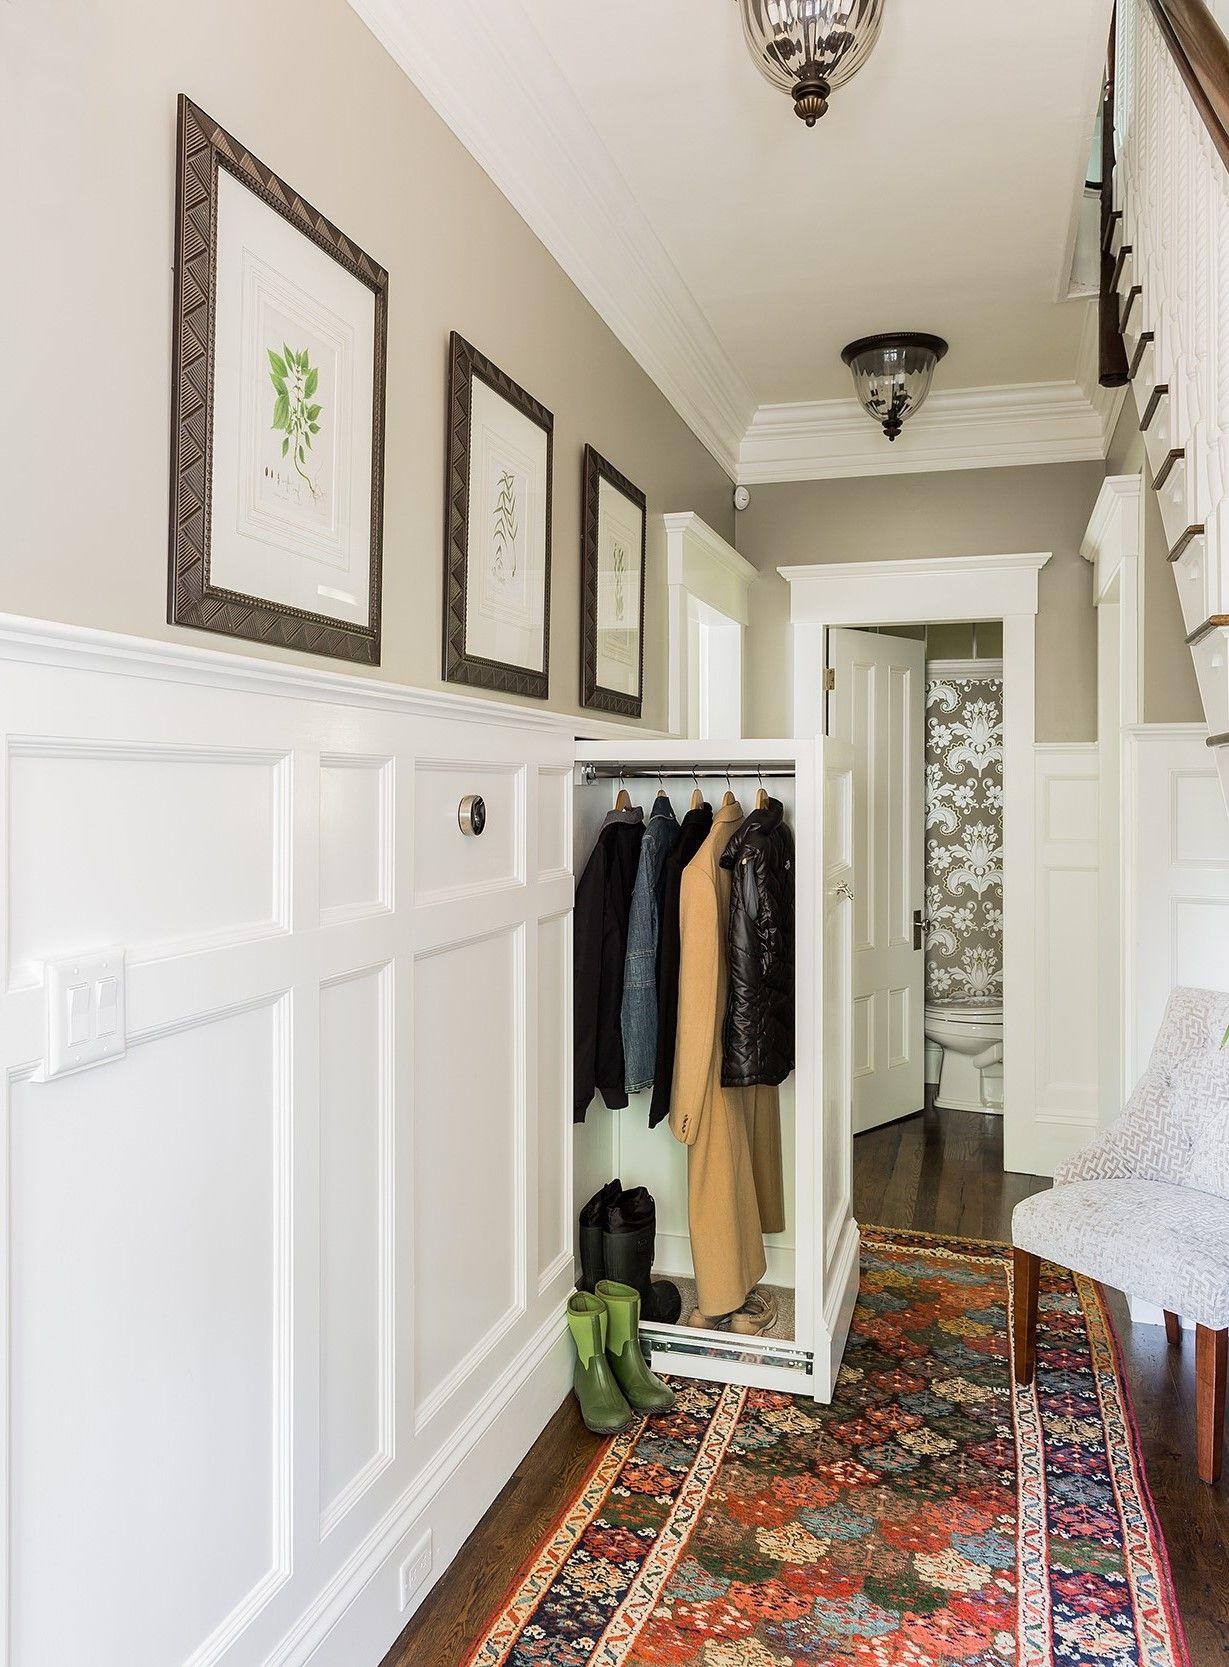 Hallway coat closet  High wainscot paneling add formality and character A hidden slide